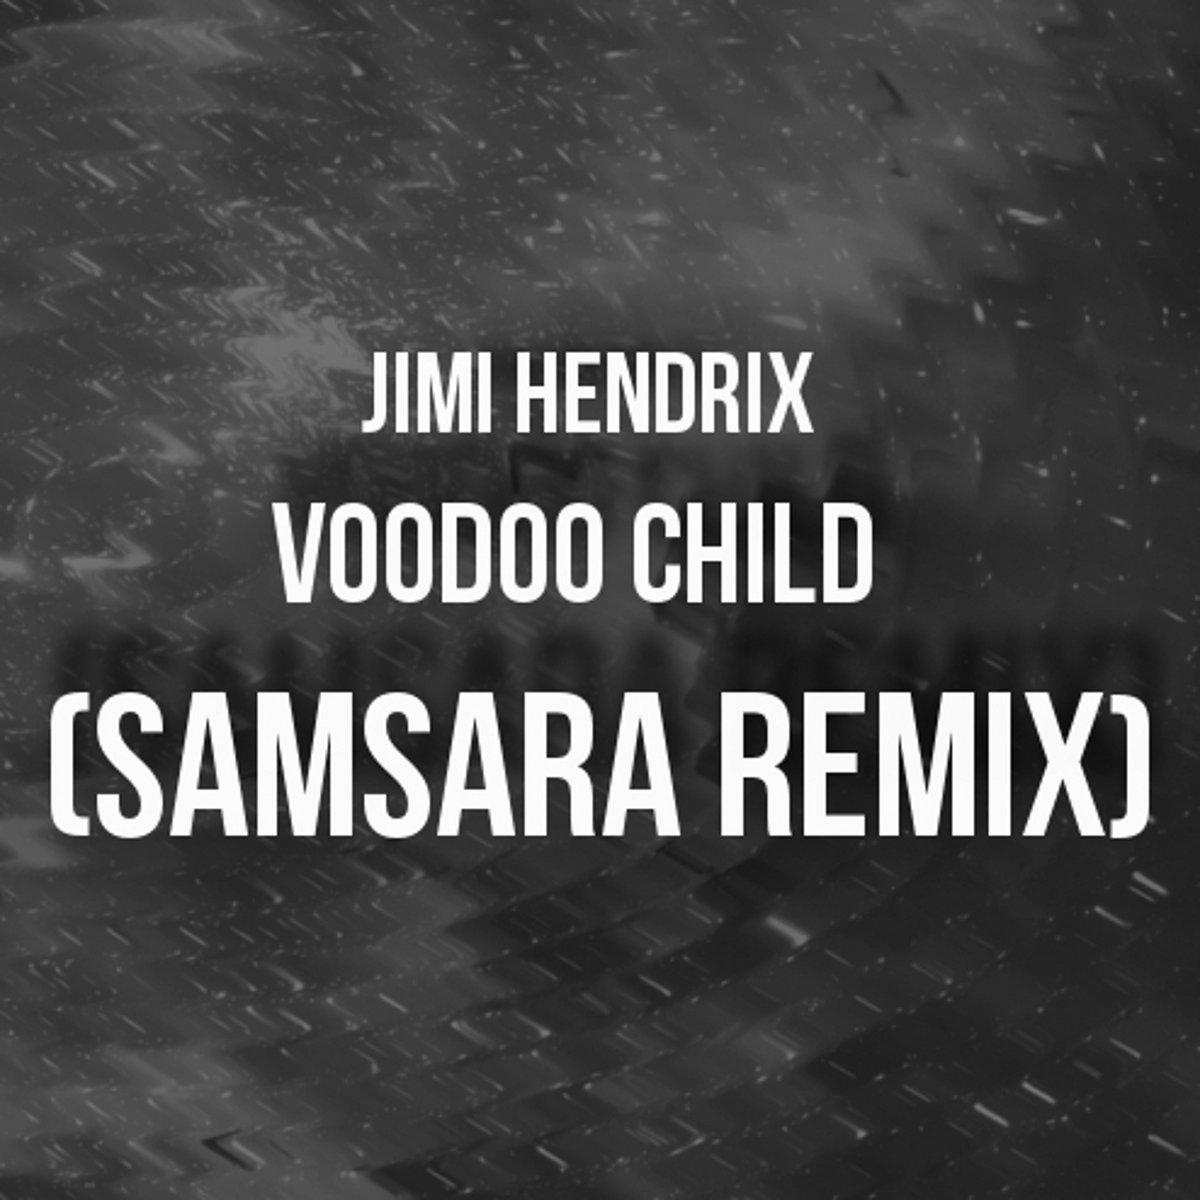 free download mp3 jimi hendrix voodoo child